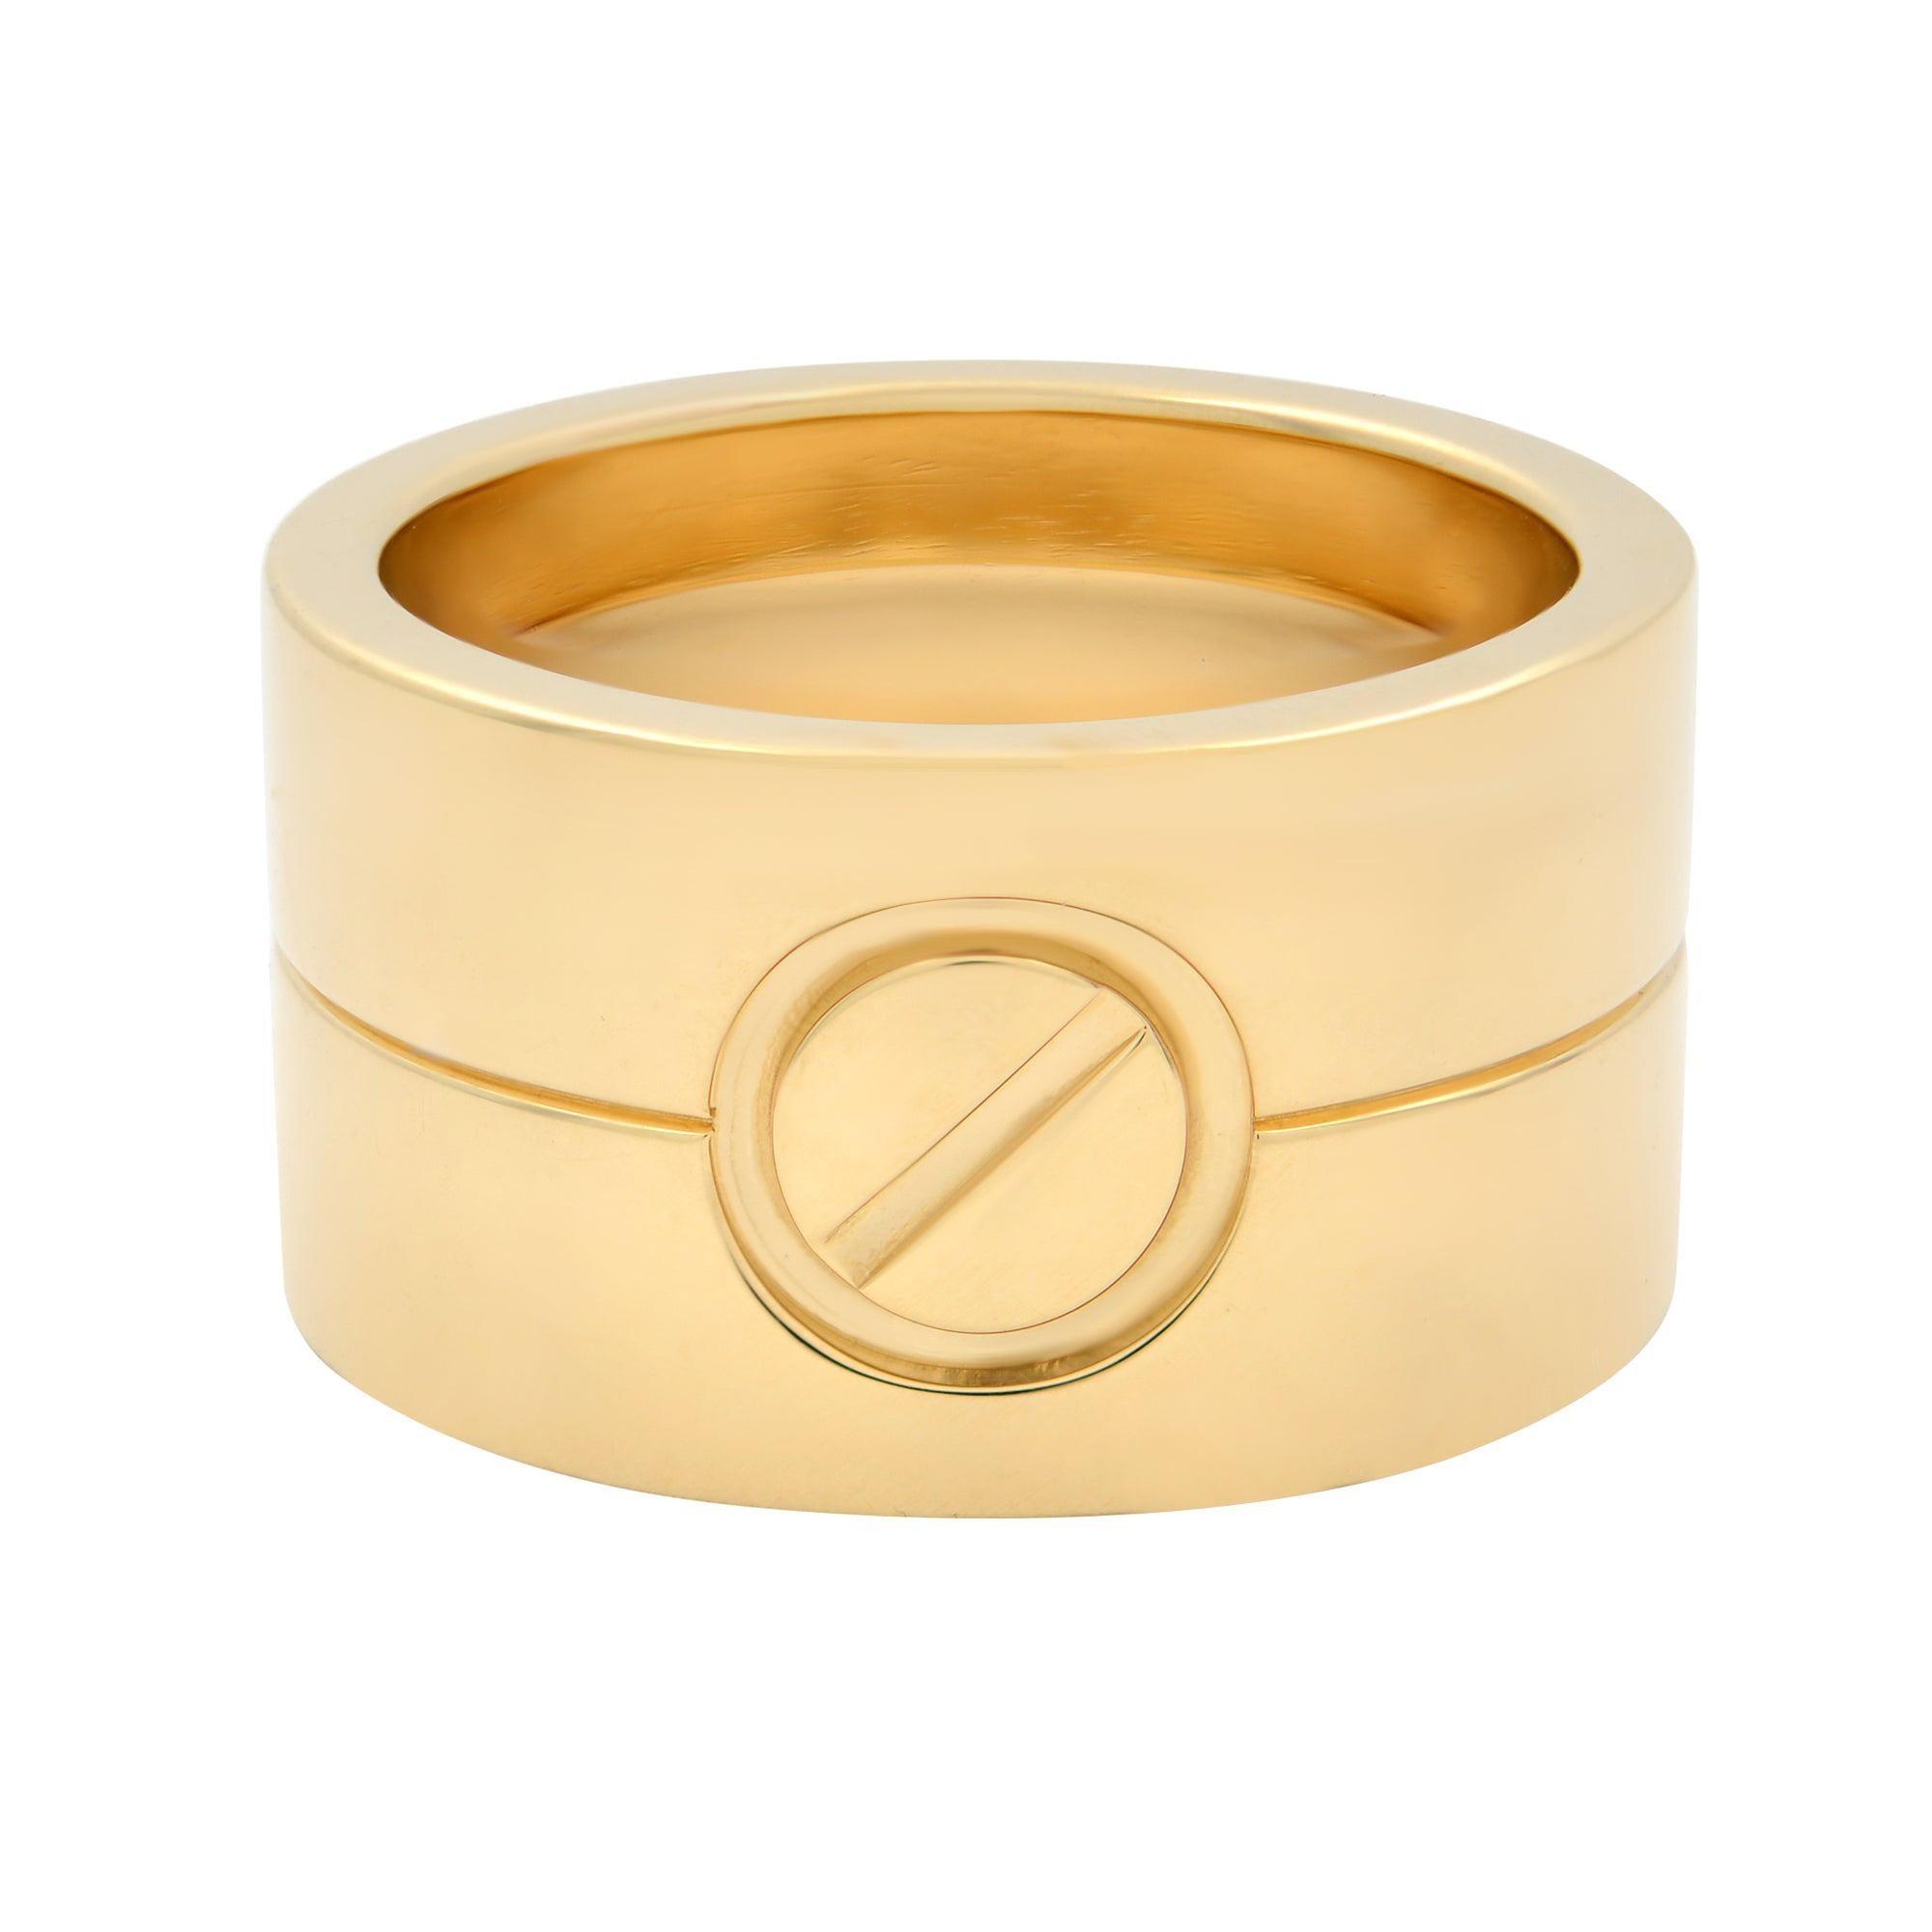 Cartier 18K Yellow Gold High Love Ring